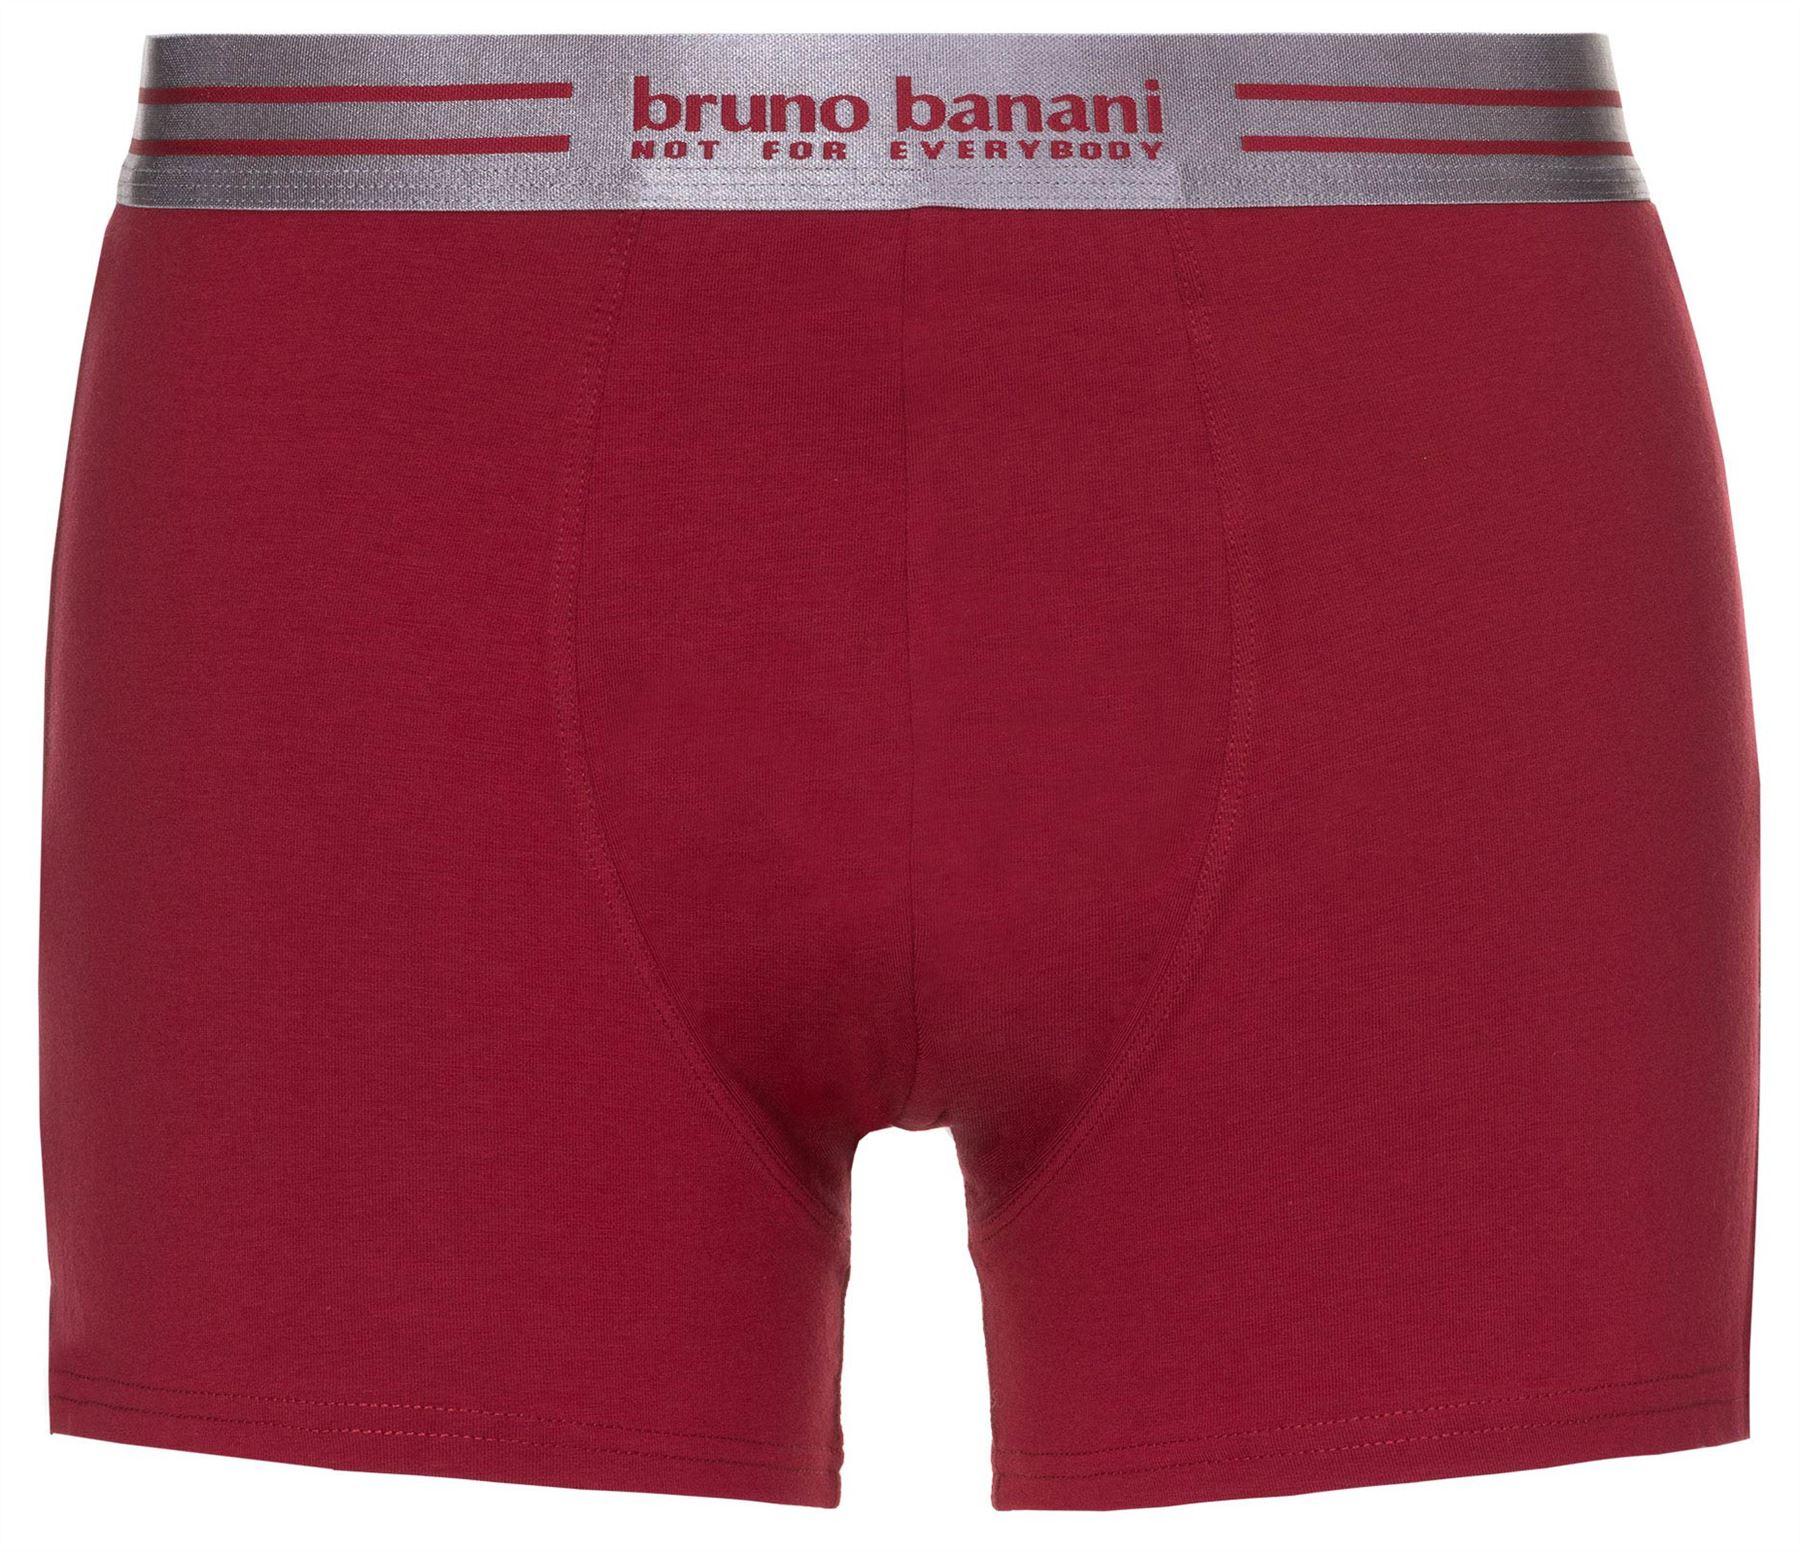 Bruno Banani Straight Line Hip Short Smooth Pinstripe Boxer Brief Trunk